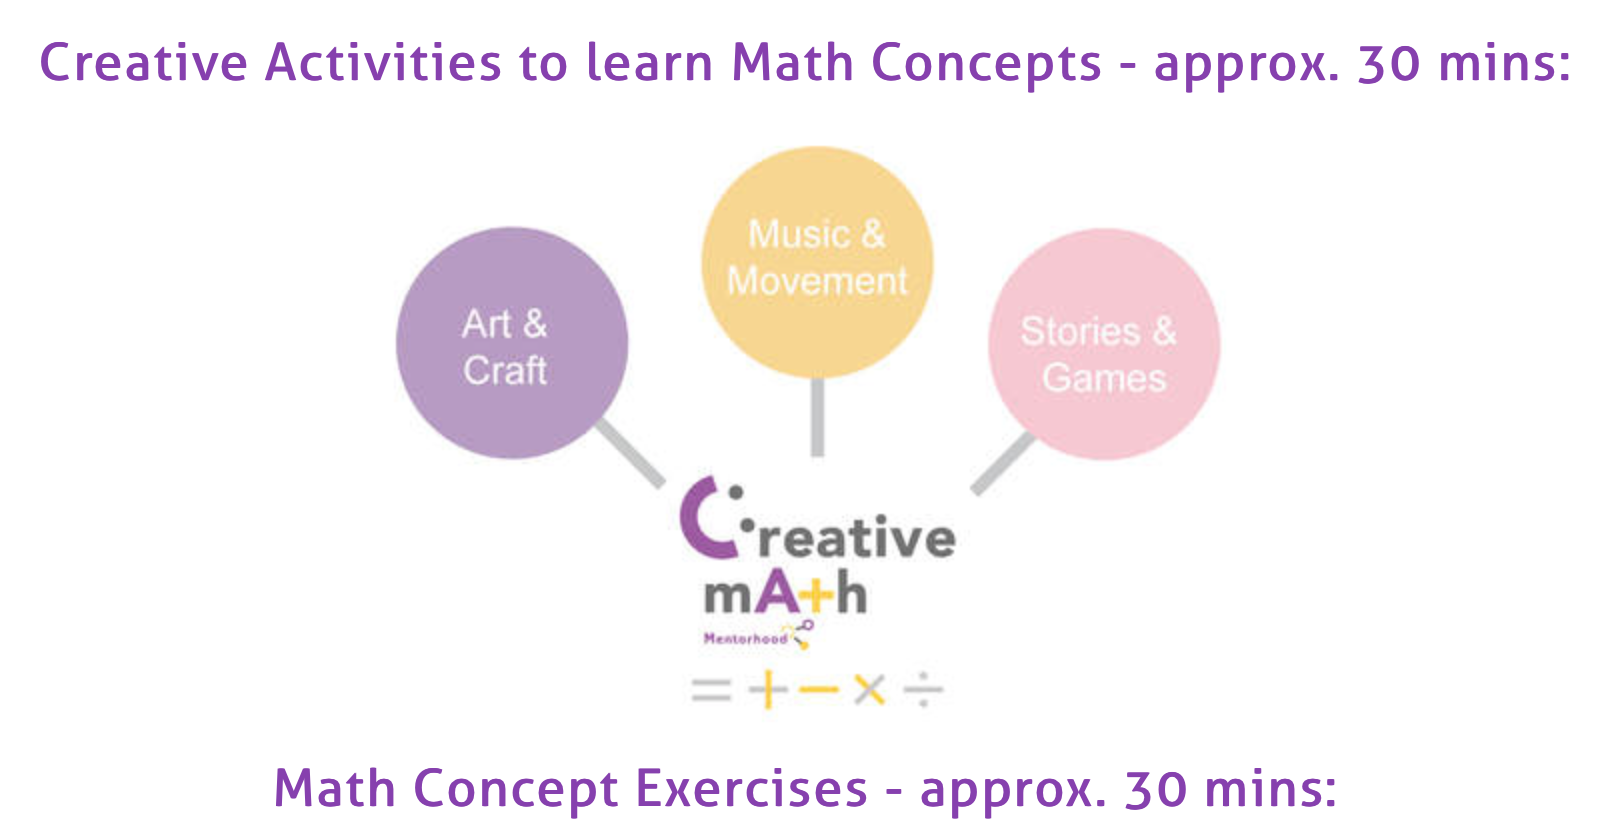 CreativeActivities.png